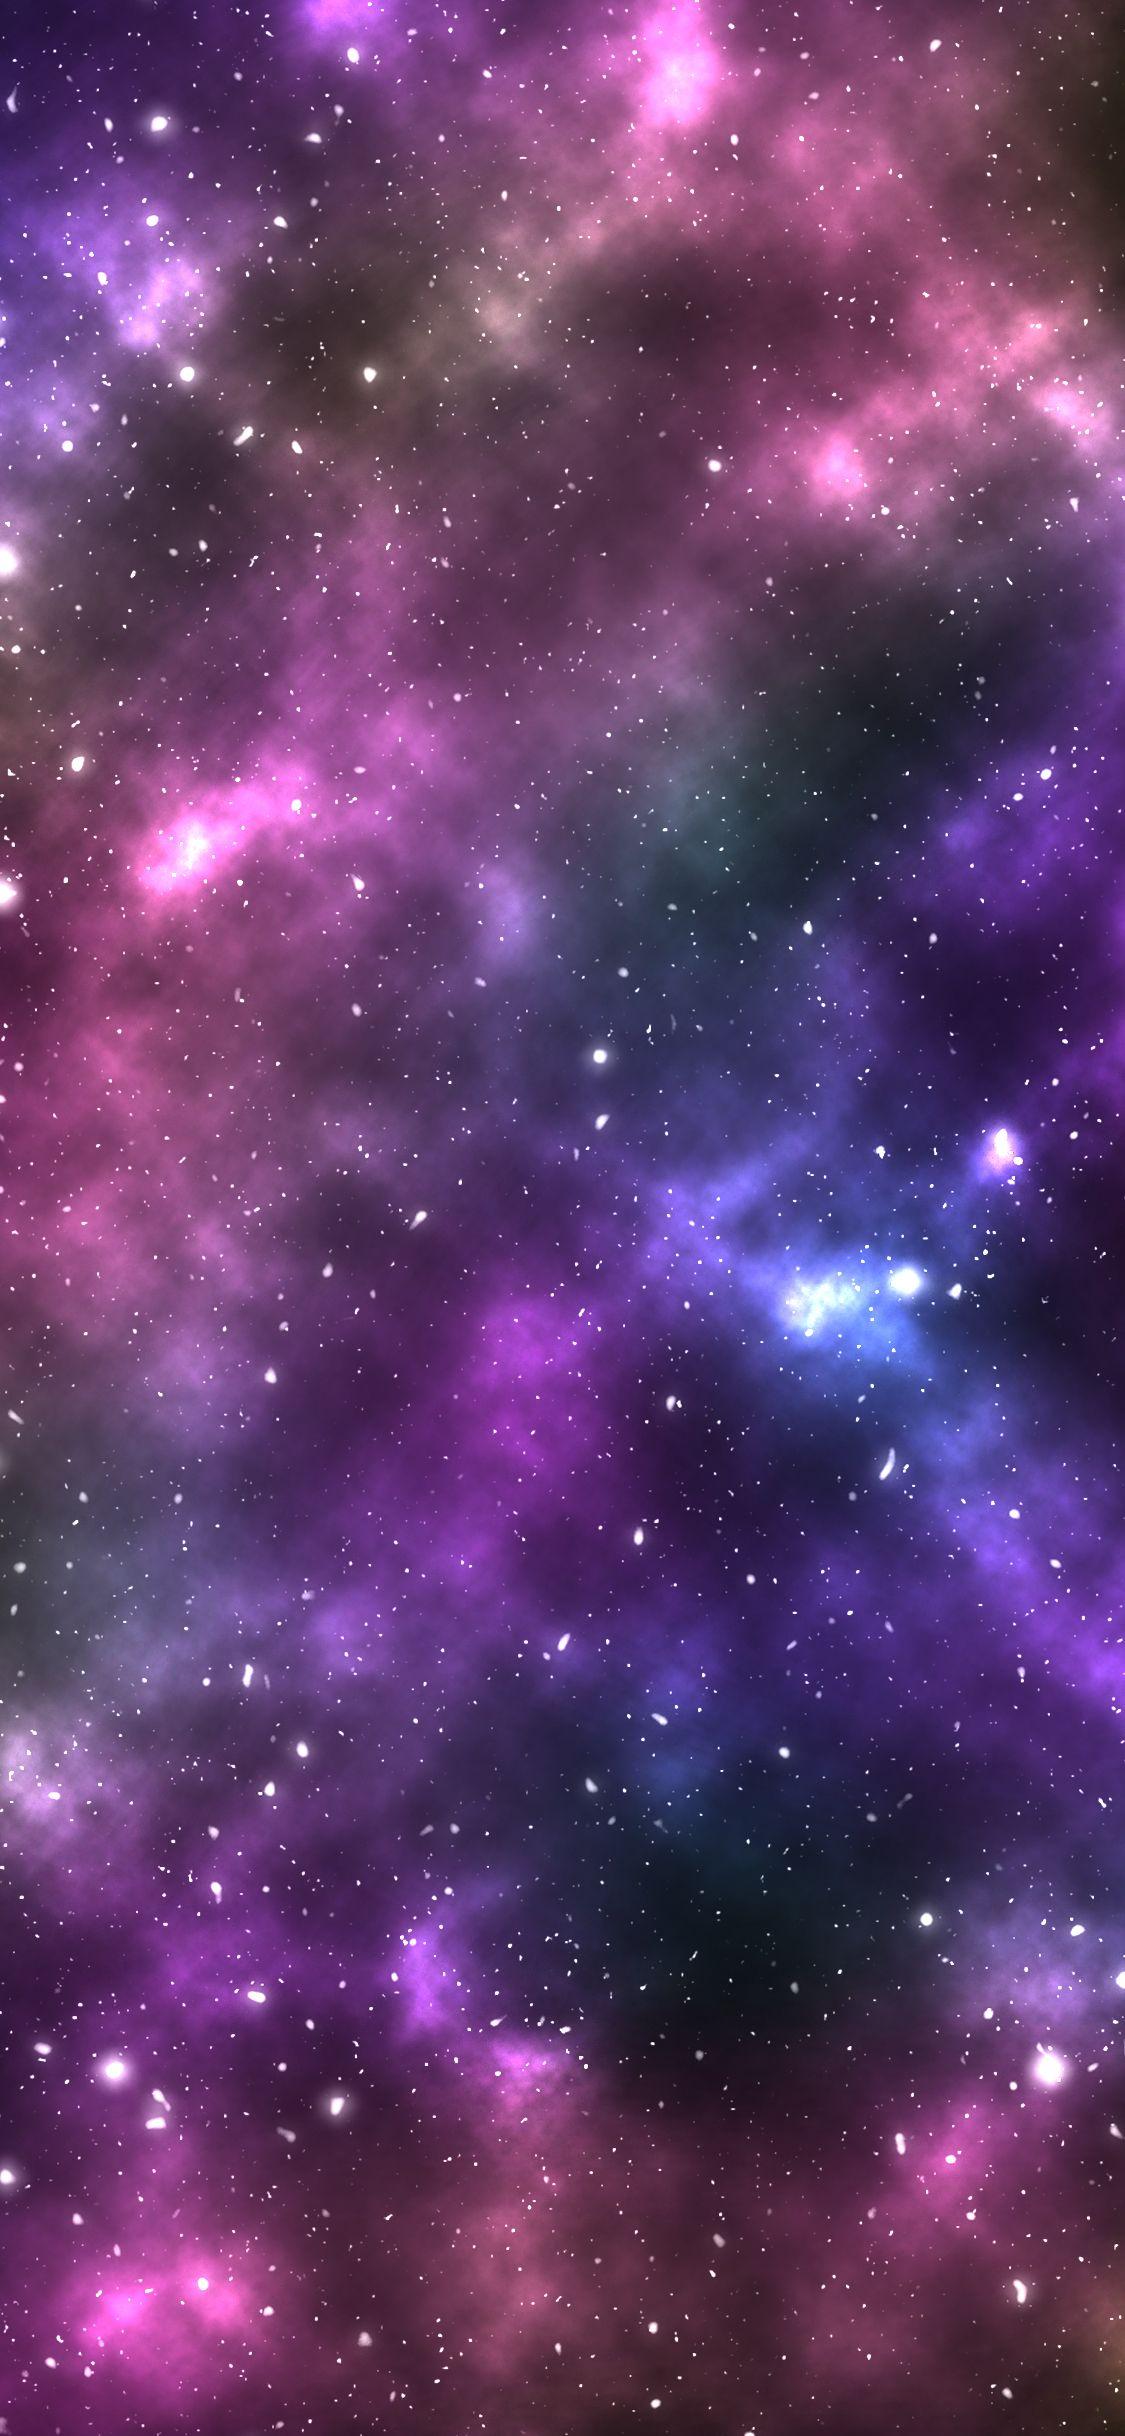 Galaxy Wallpaper Vector Images Galaxy Wallpaper Iphone Galaxy Wallpaper Hd Galaxy Wallpaper